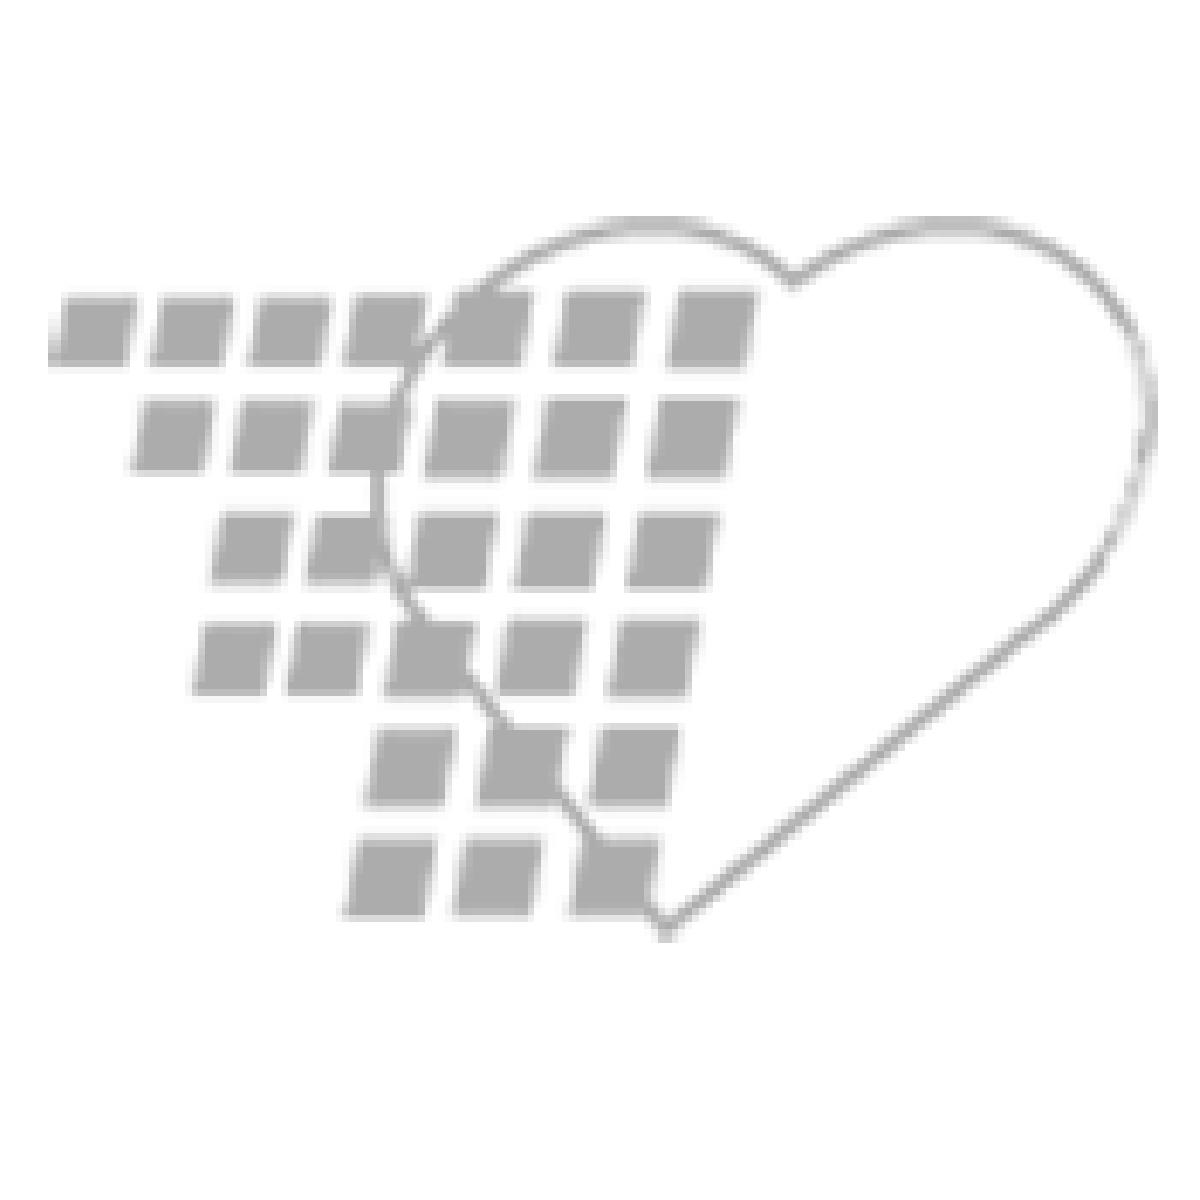 11-81-1042 Nasco Life/form® Suture Kit